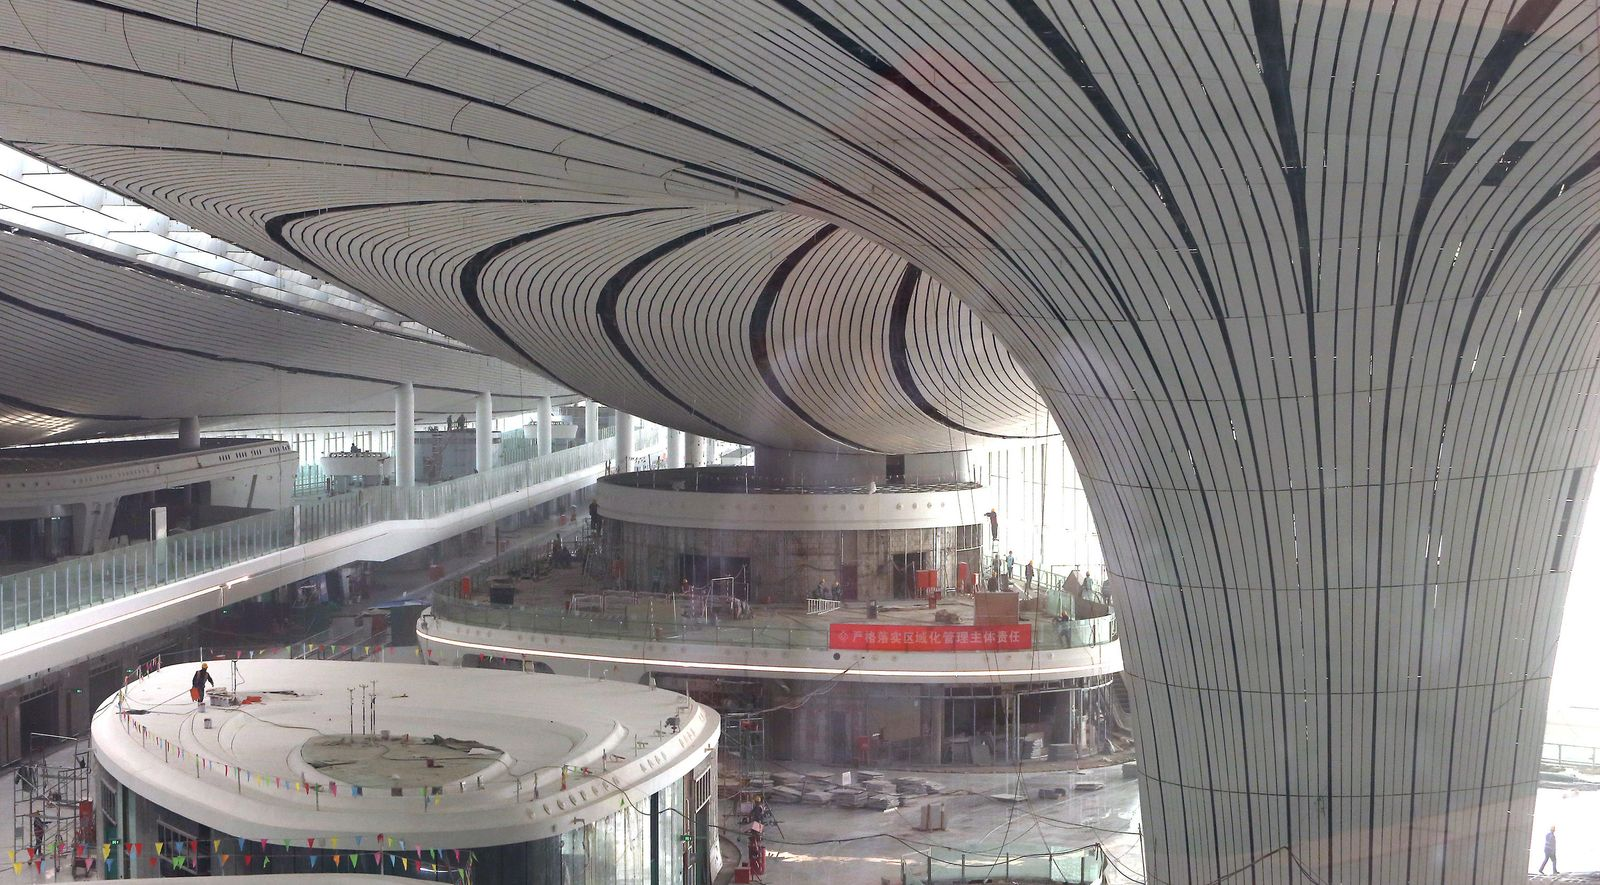 Bauarbeiten am internationalen Flughafen Peking-Daxing